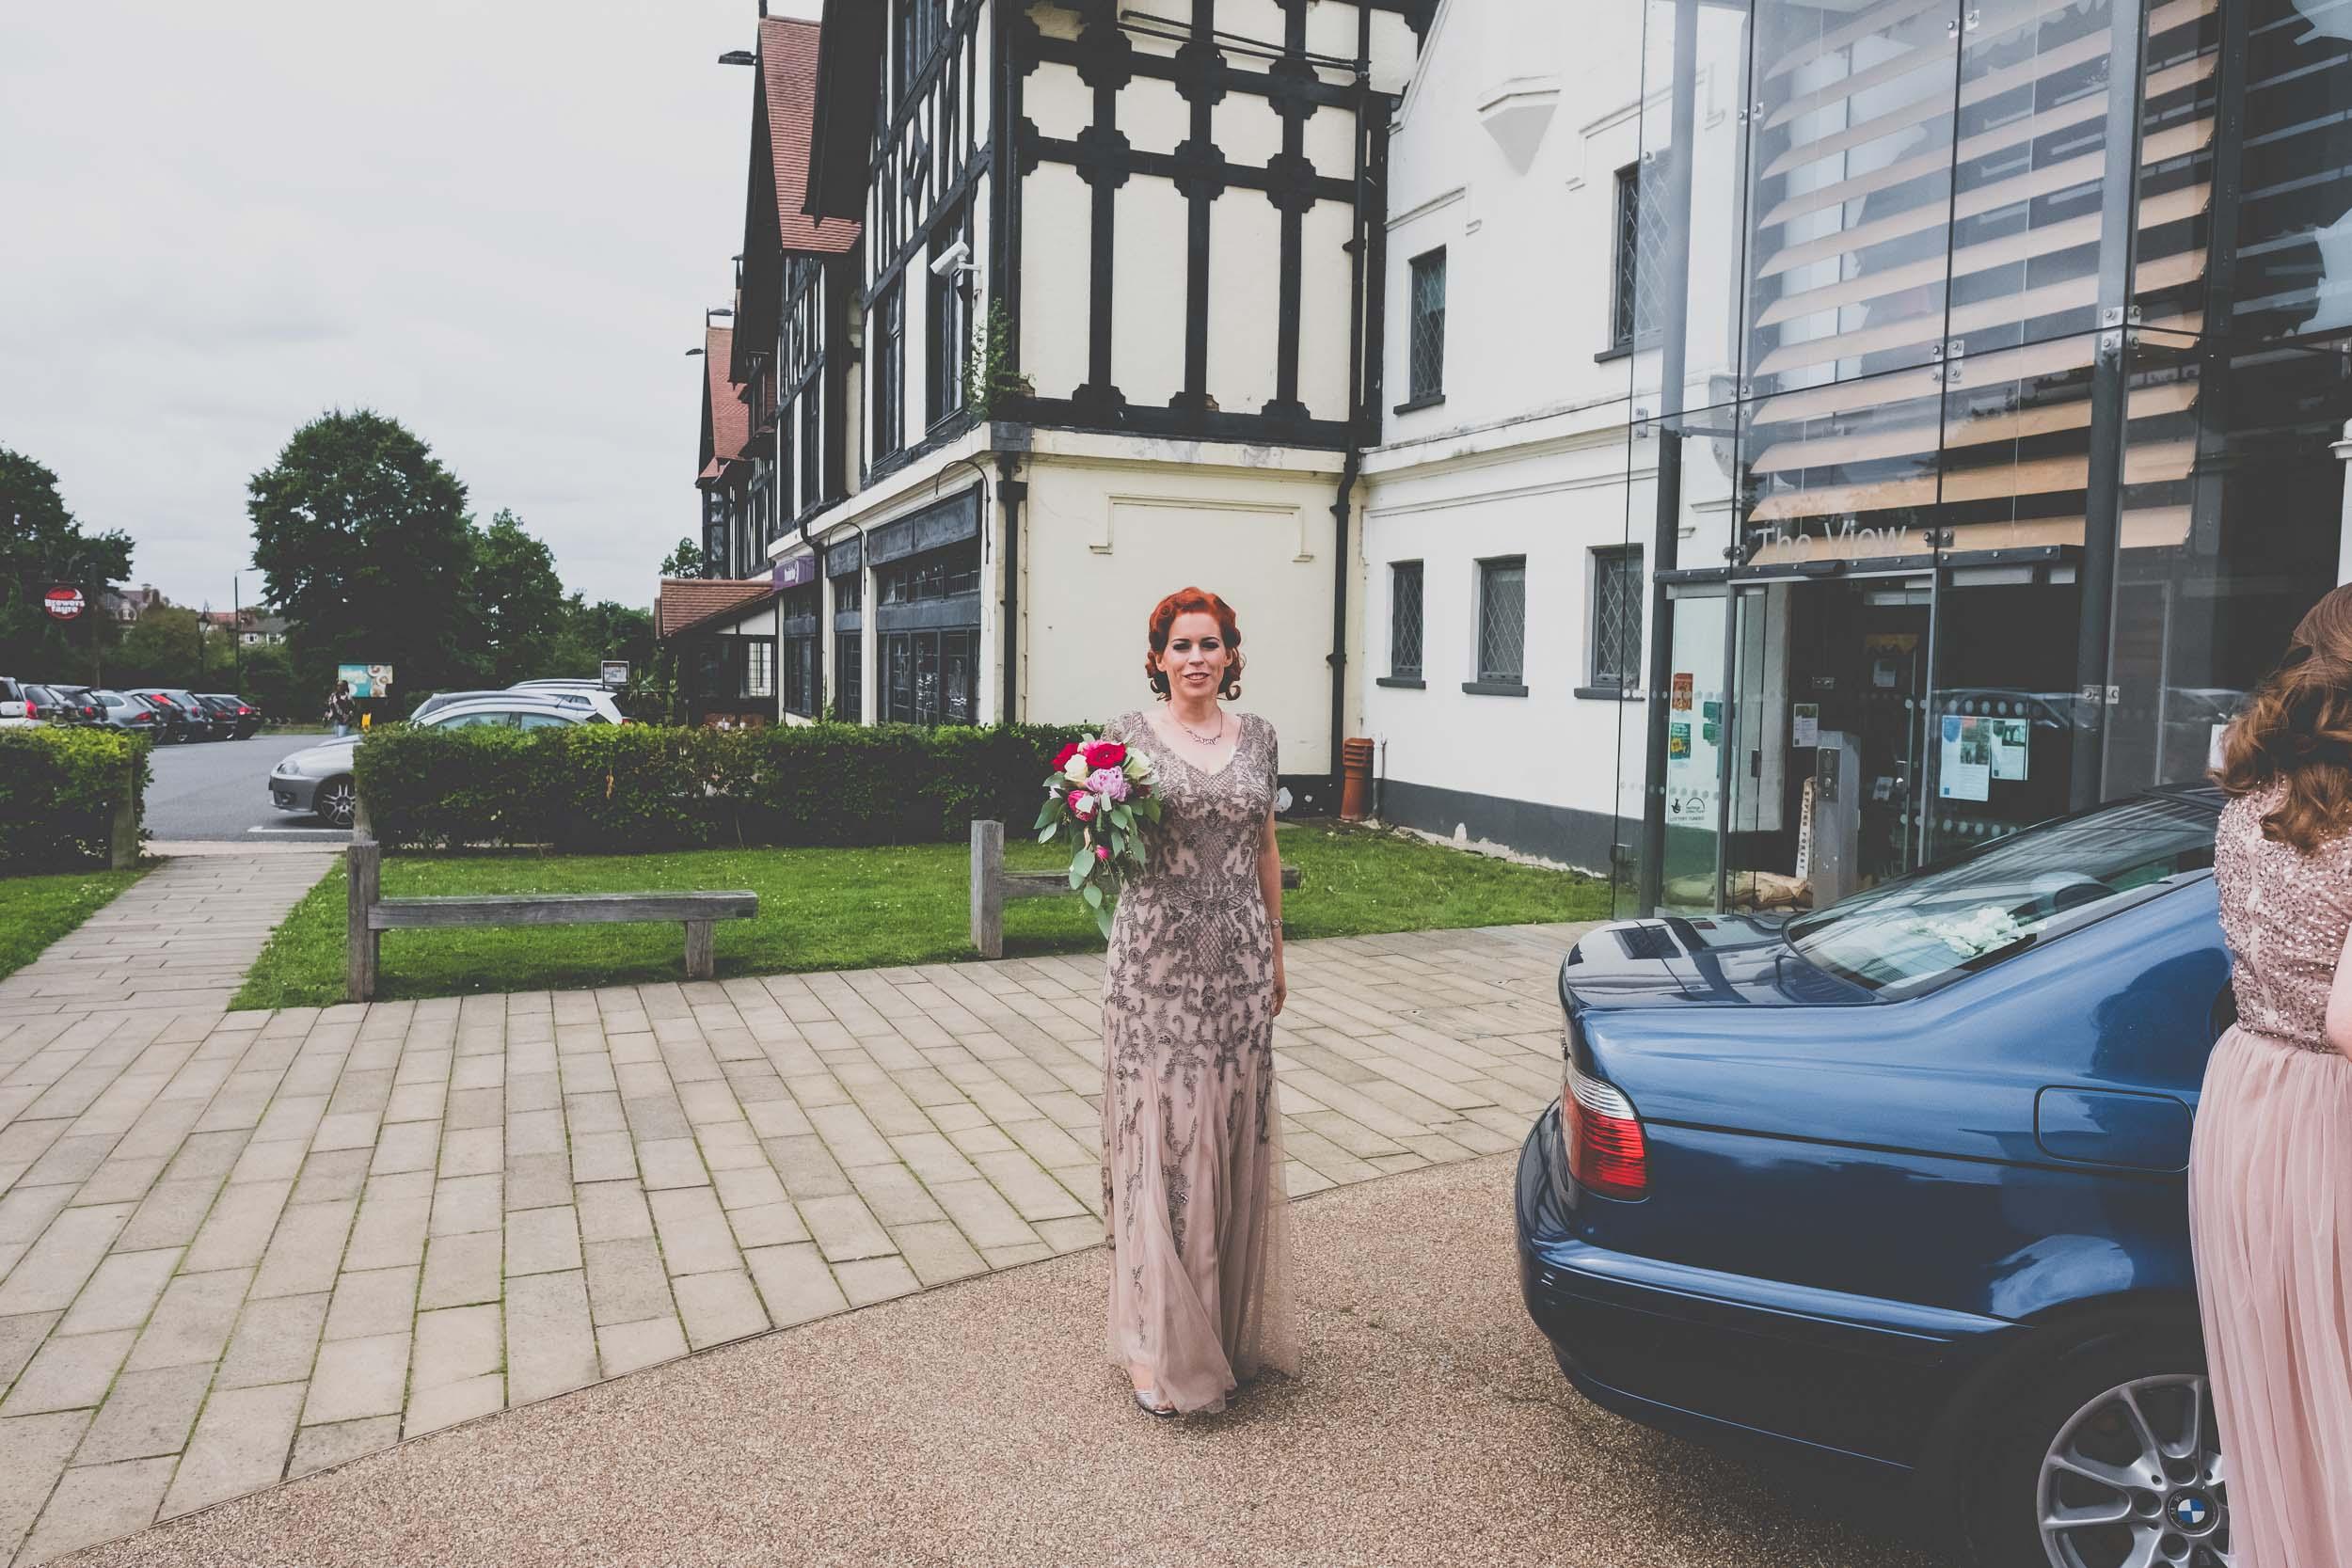 queen-elizabeths-hunting-lodge-epping-forest-wedding018.jpg